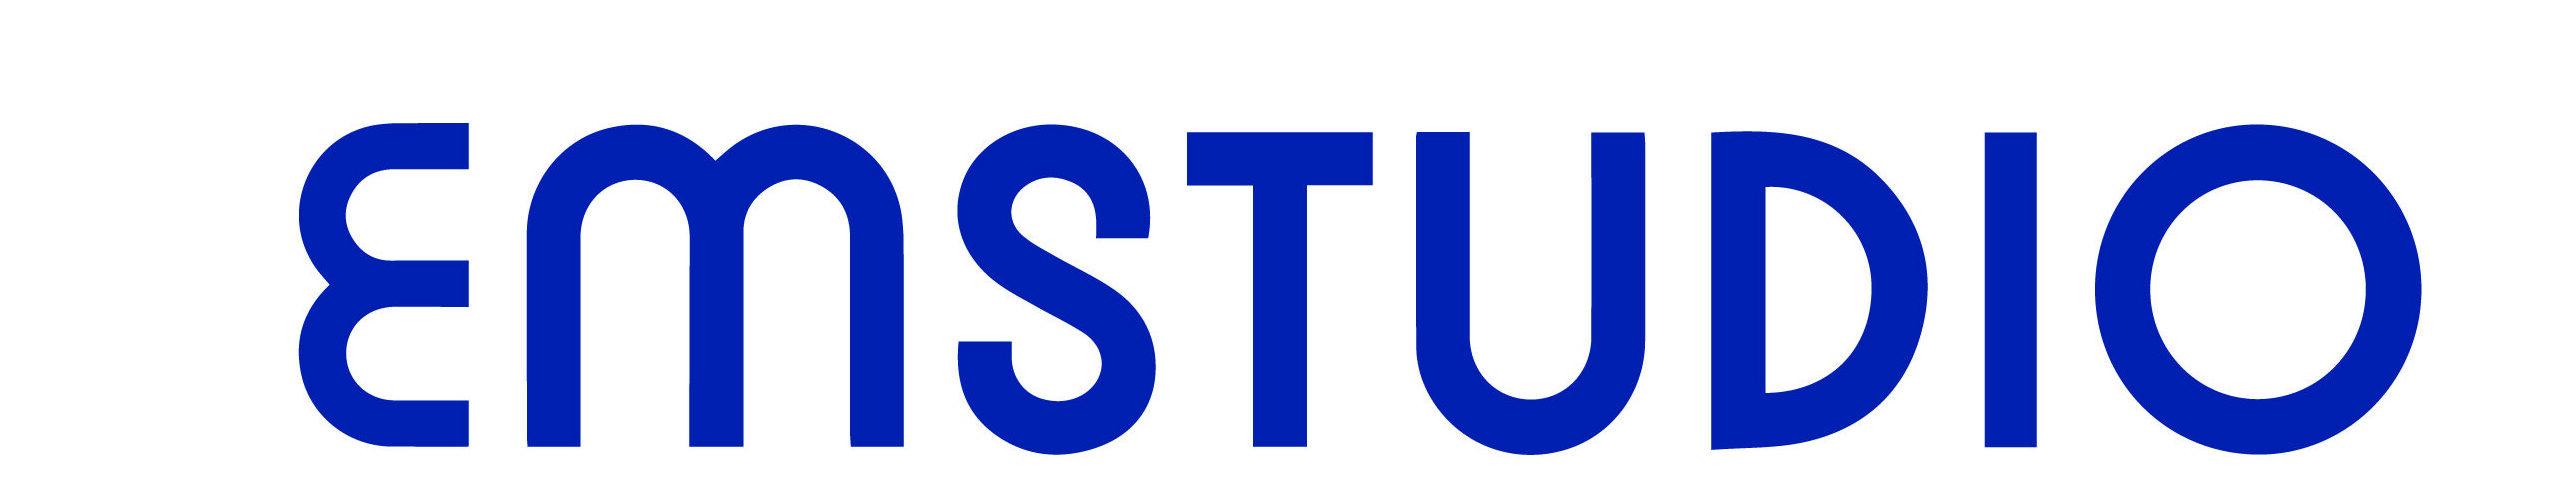 Nasze marki - Logo